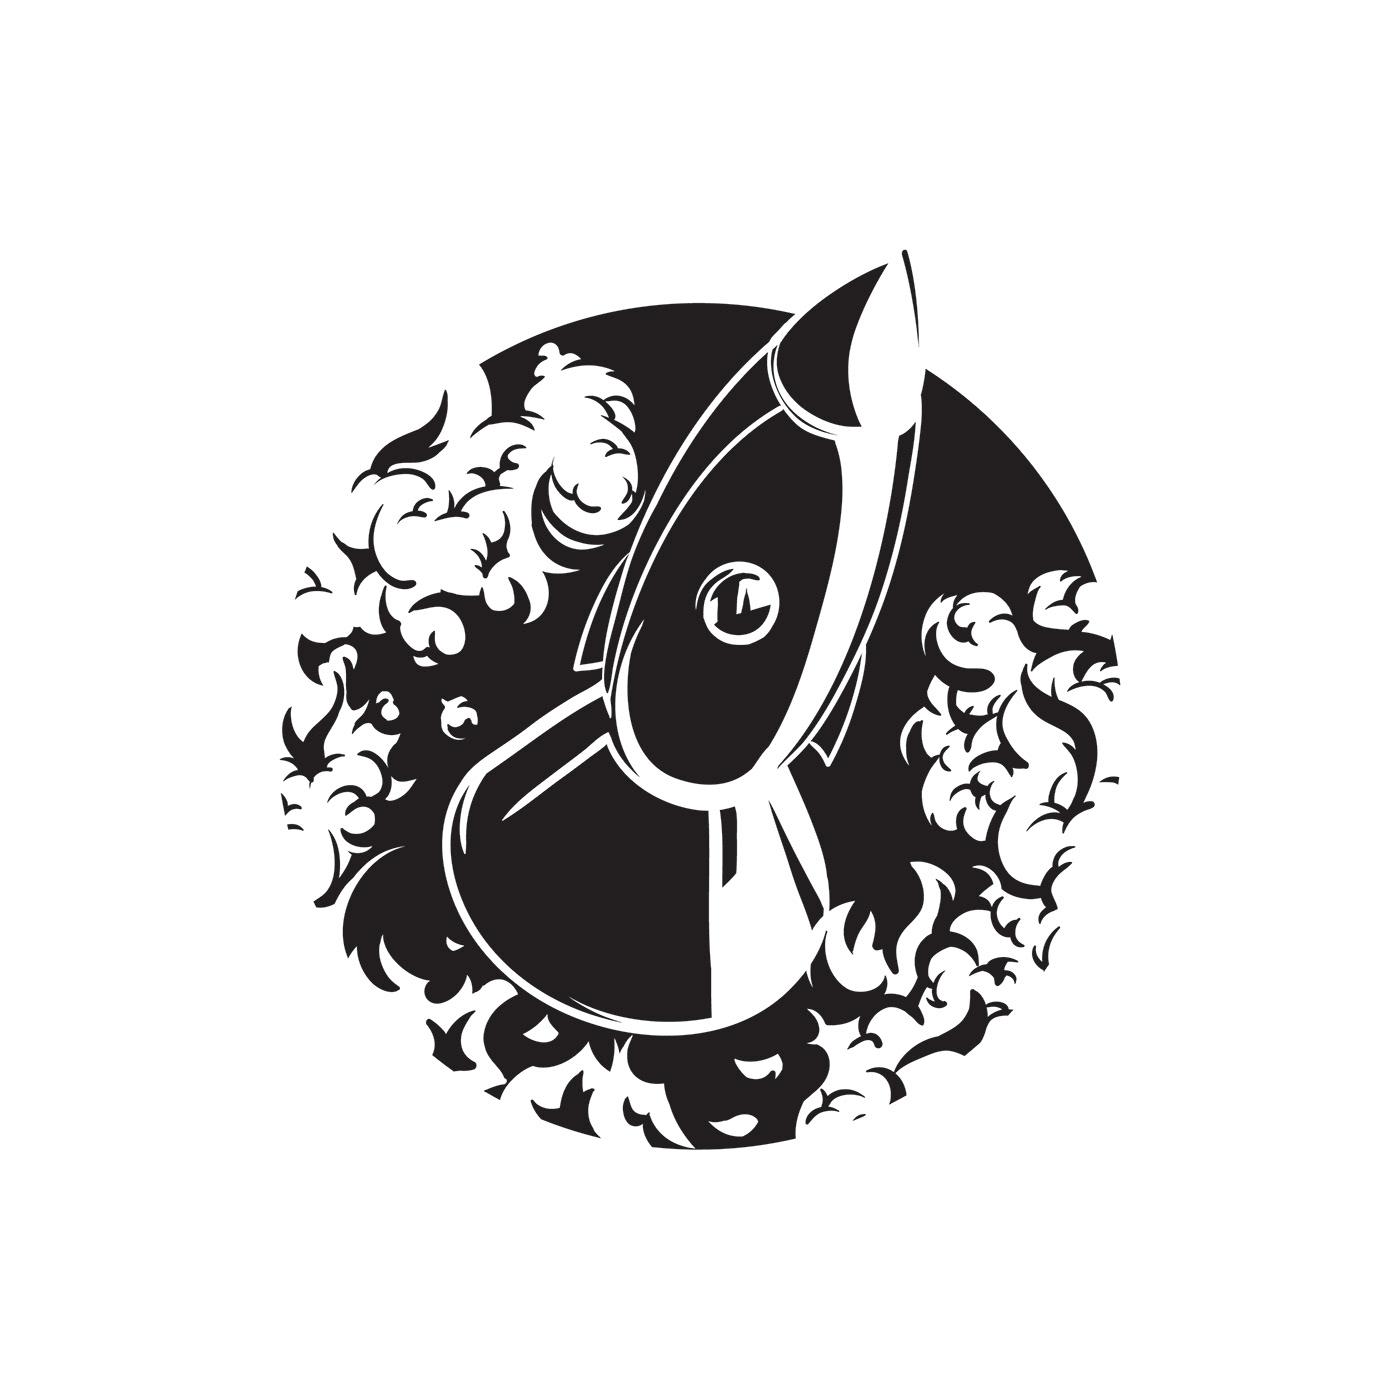 rocket ILLUSTRATION  Illustrator graphic design t-shirt b&w